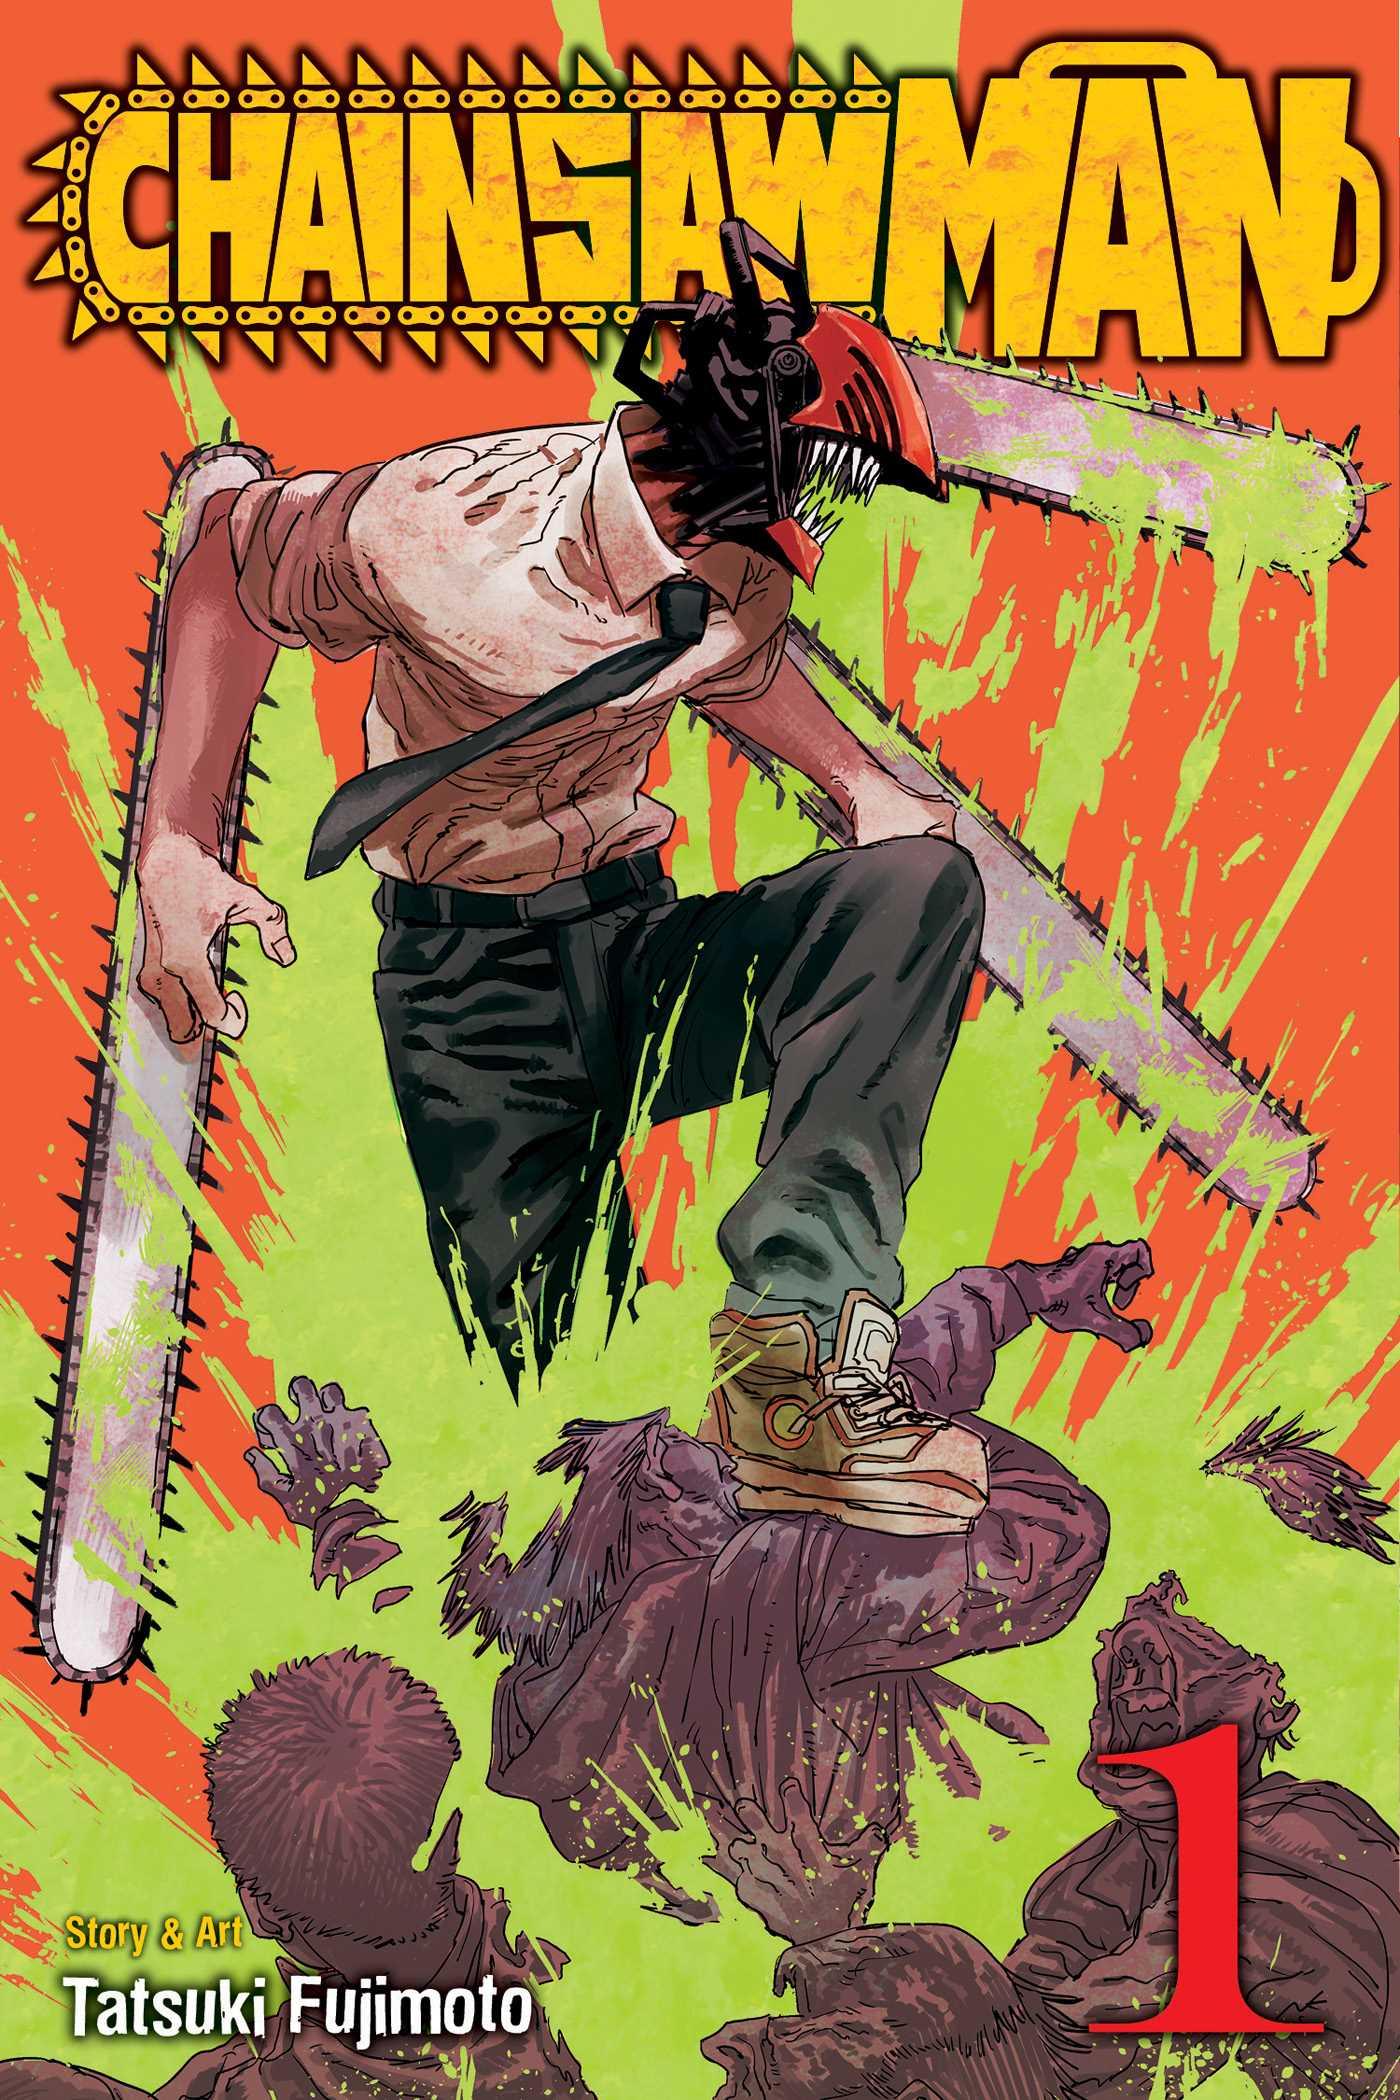 Chainsaw Man, Vol. 1 | Book by Tatsuki Fujimoto | Official Publisher Page | Simon & Schuster